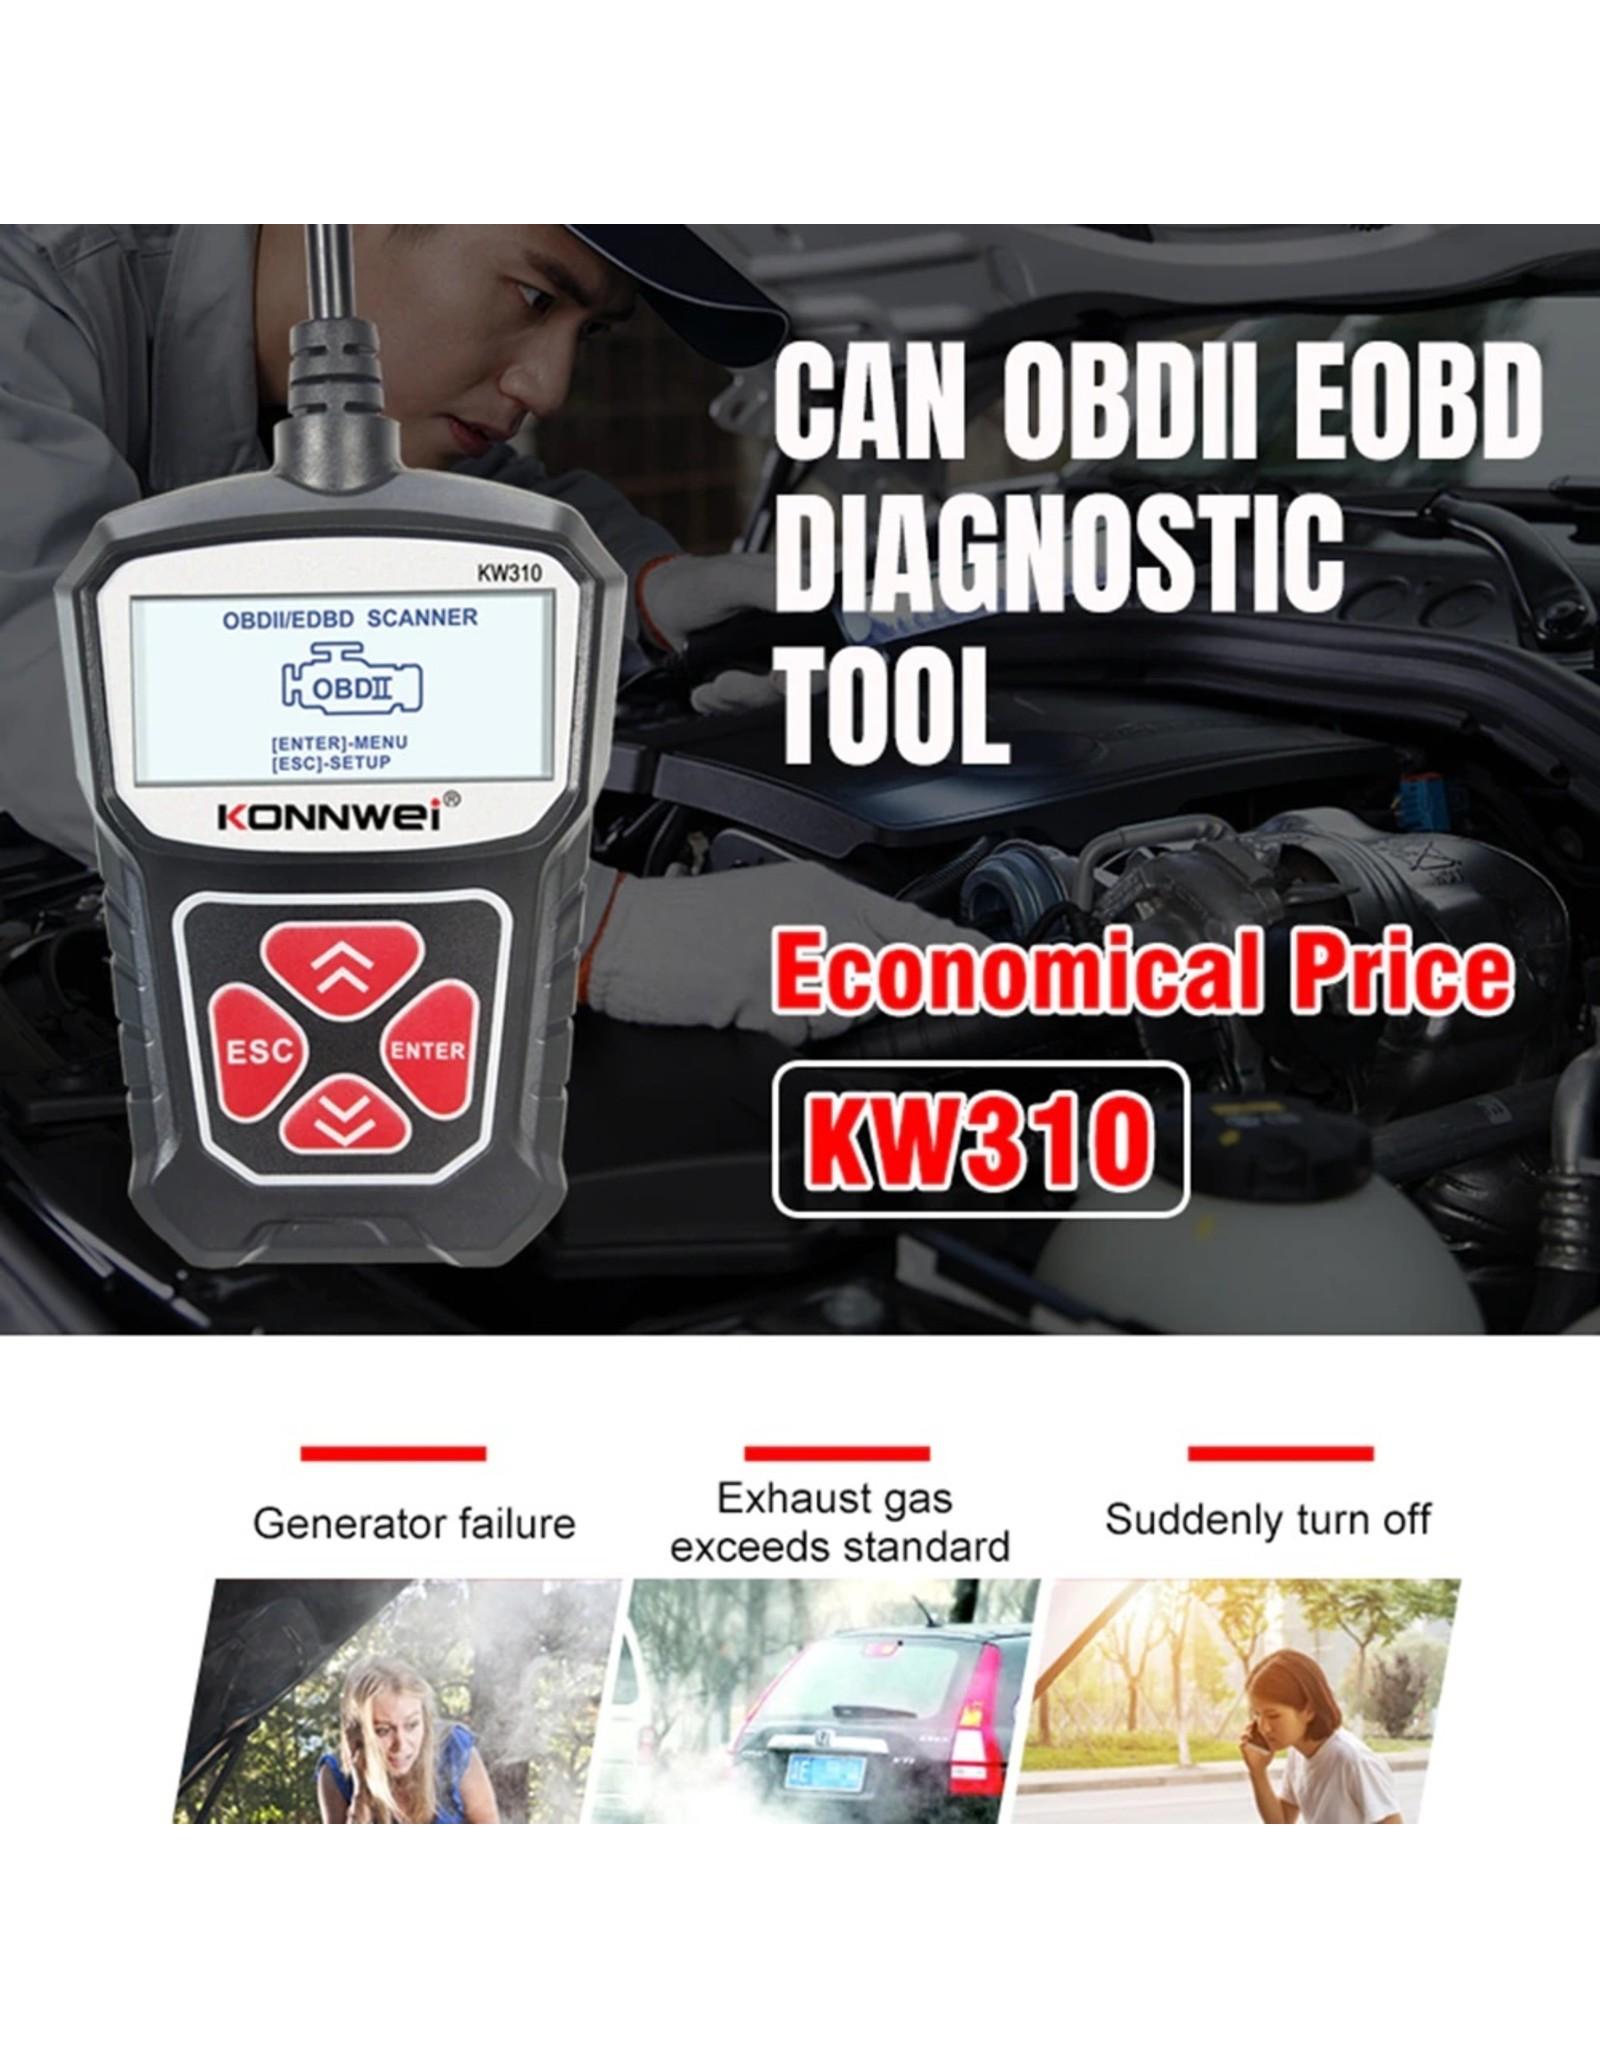 KONNWEI KW310 OBD2 Scanner Professionele Automotive Code Reader Volledige OBD2 Scanner Multi-talen Auto Diagnostisch Scan Tool - Zwart of Rood